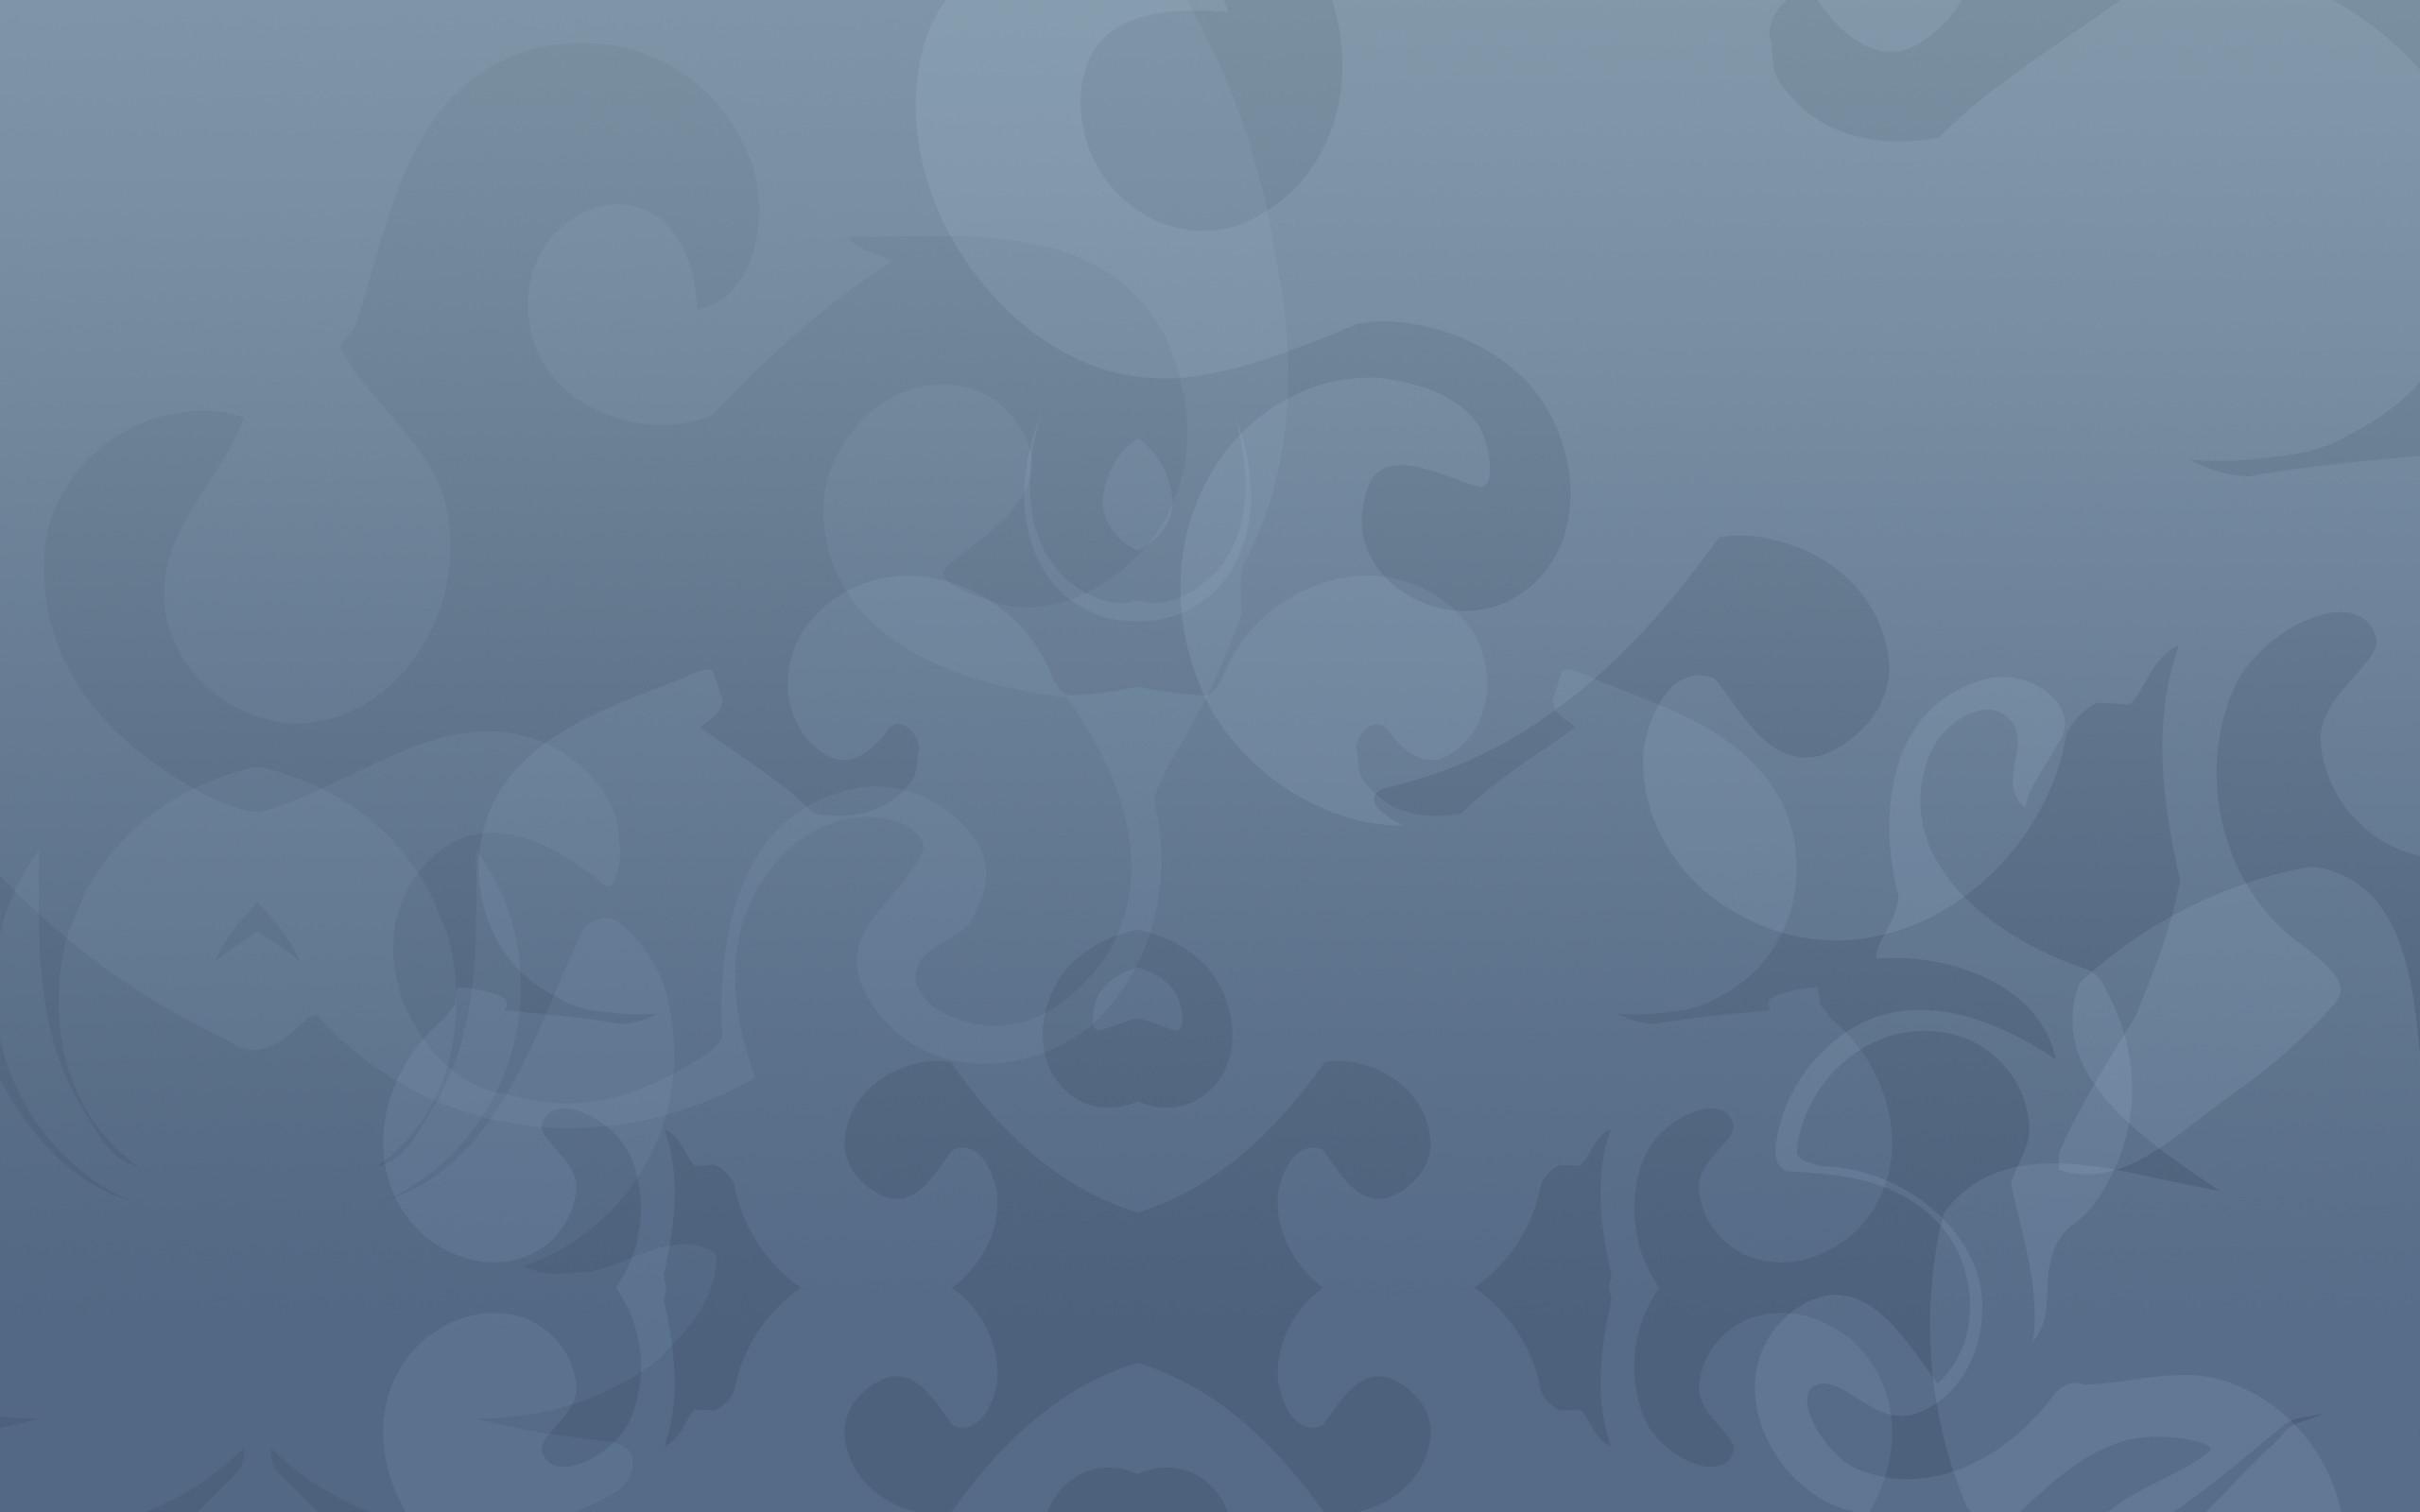 PC Blue Gray Wallpapers, Noelle Lodford